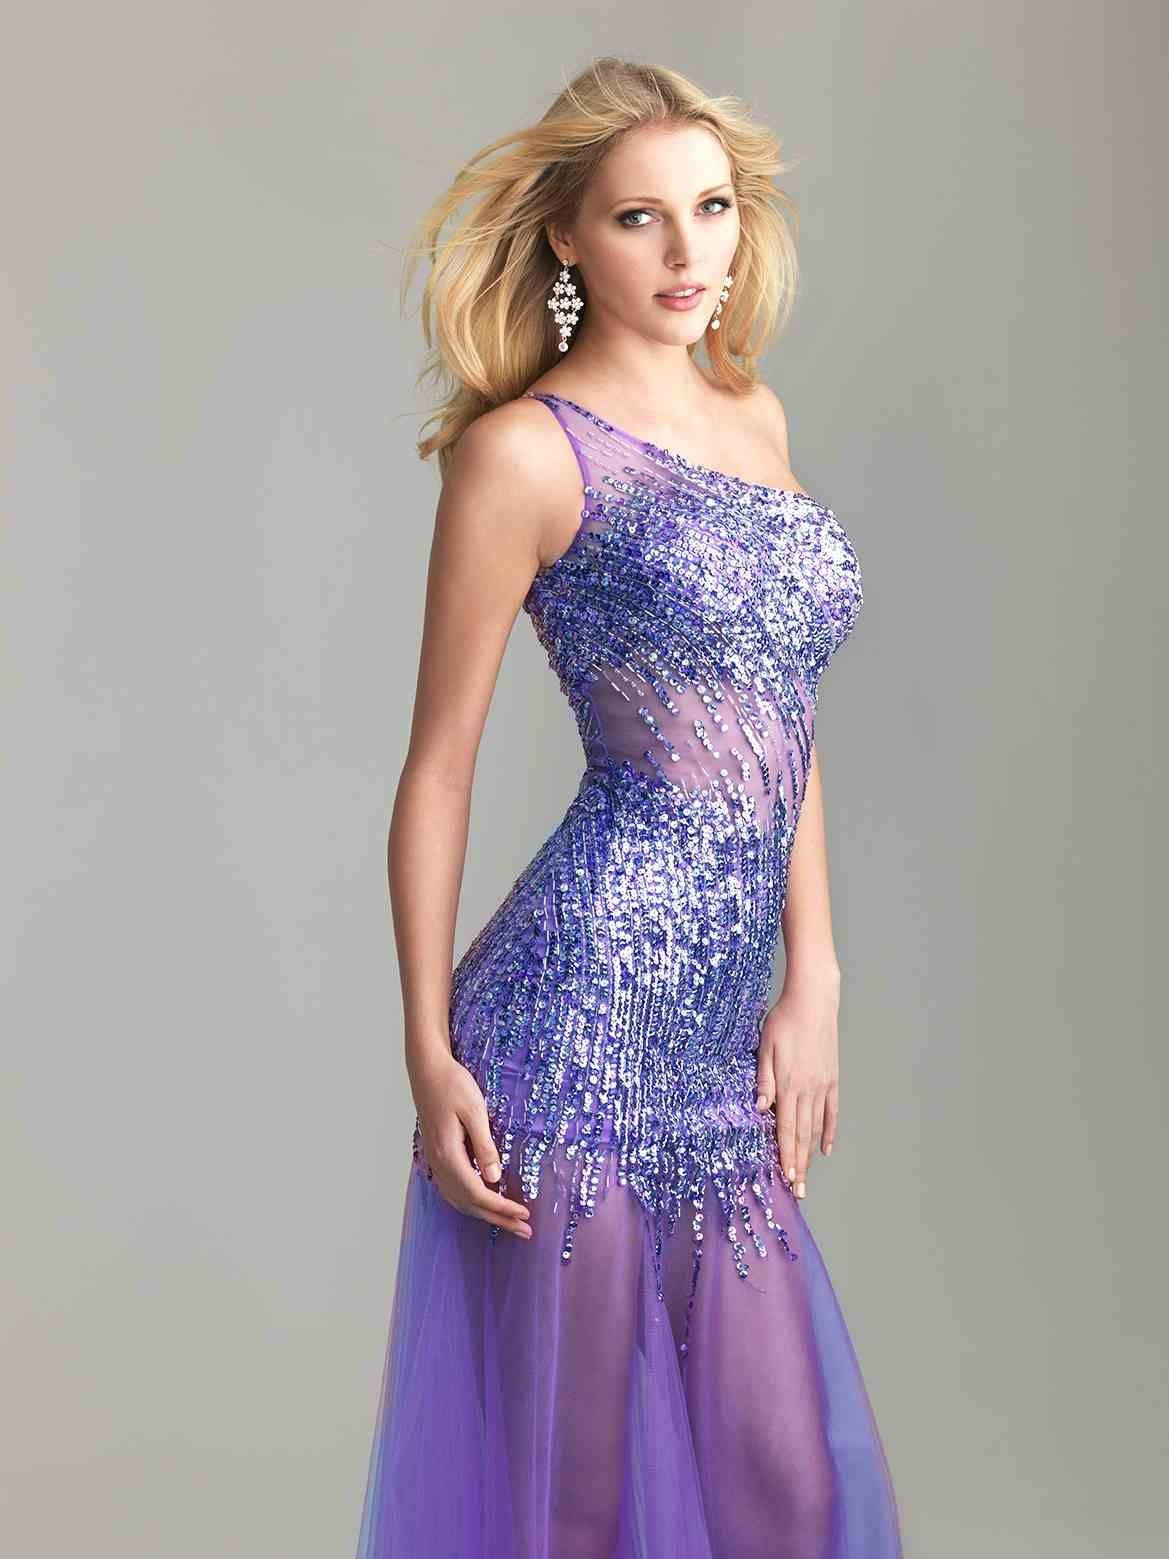 Famoso Inspiración Vintage Vestidos De Dama De Reino Unido ...